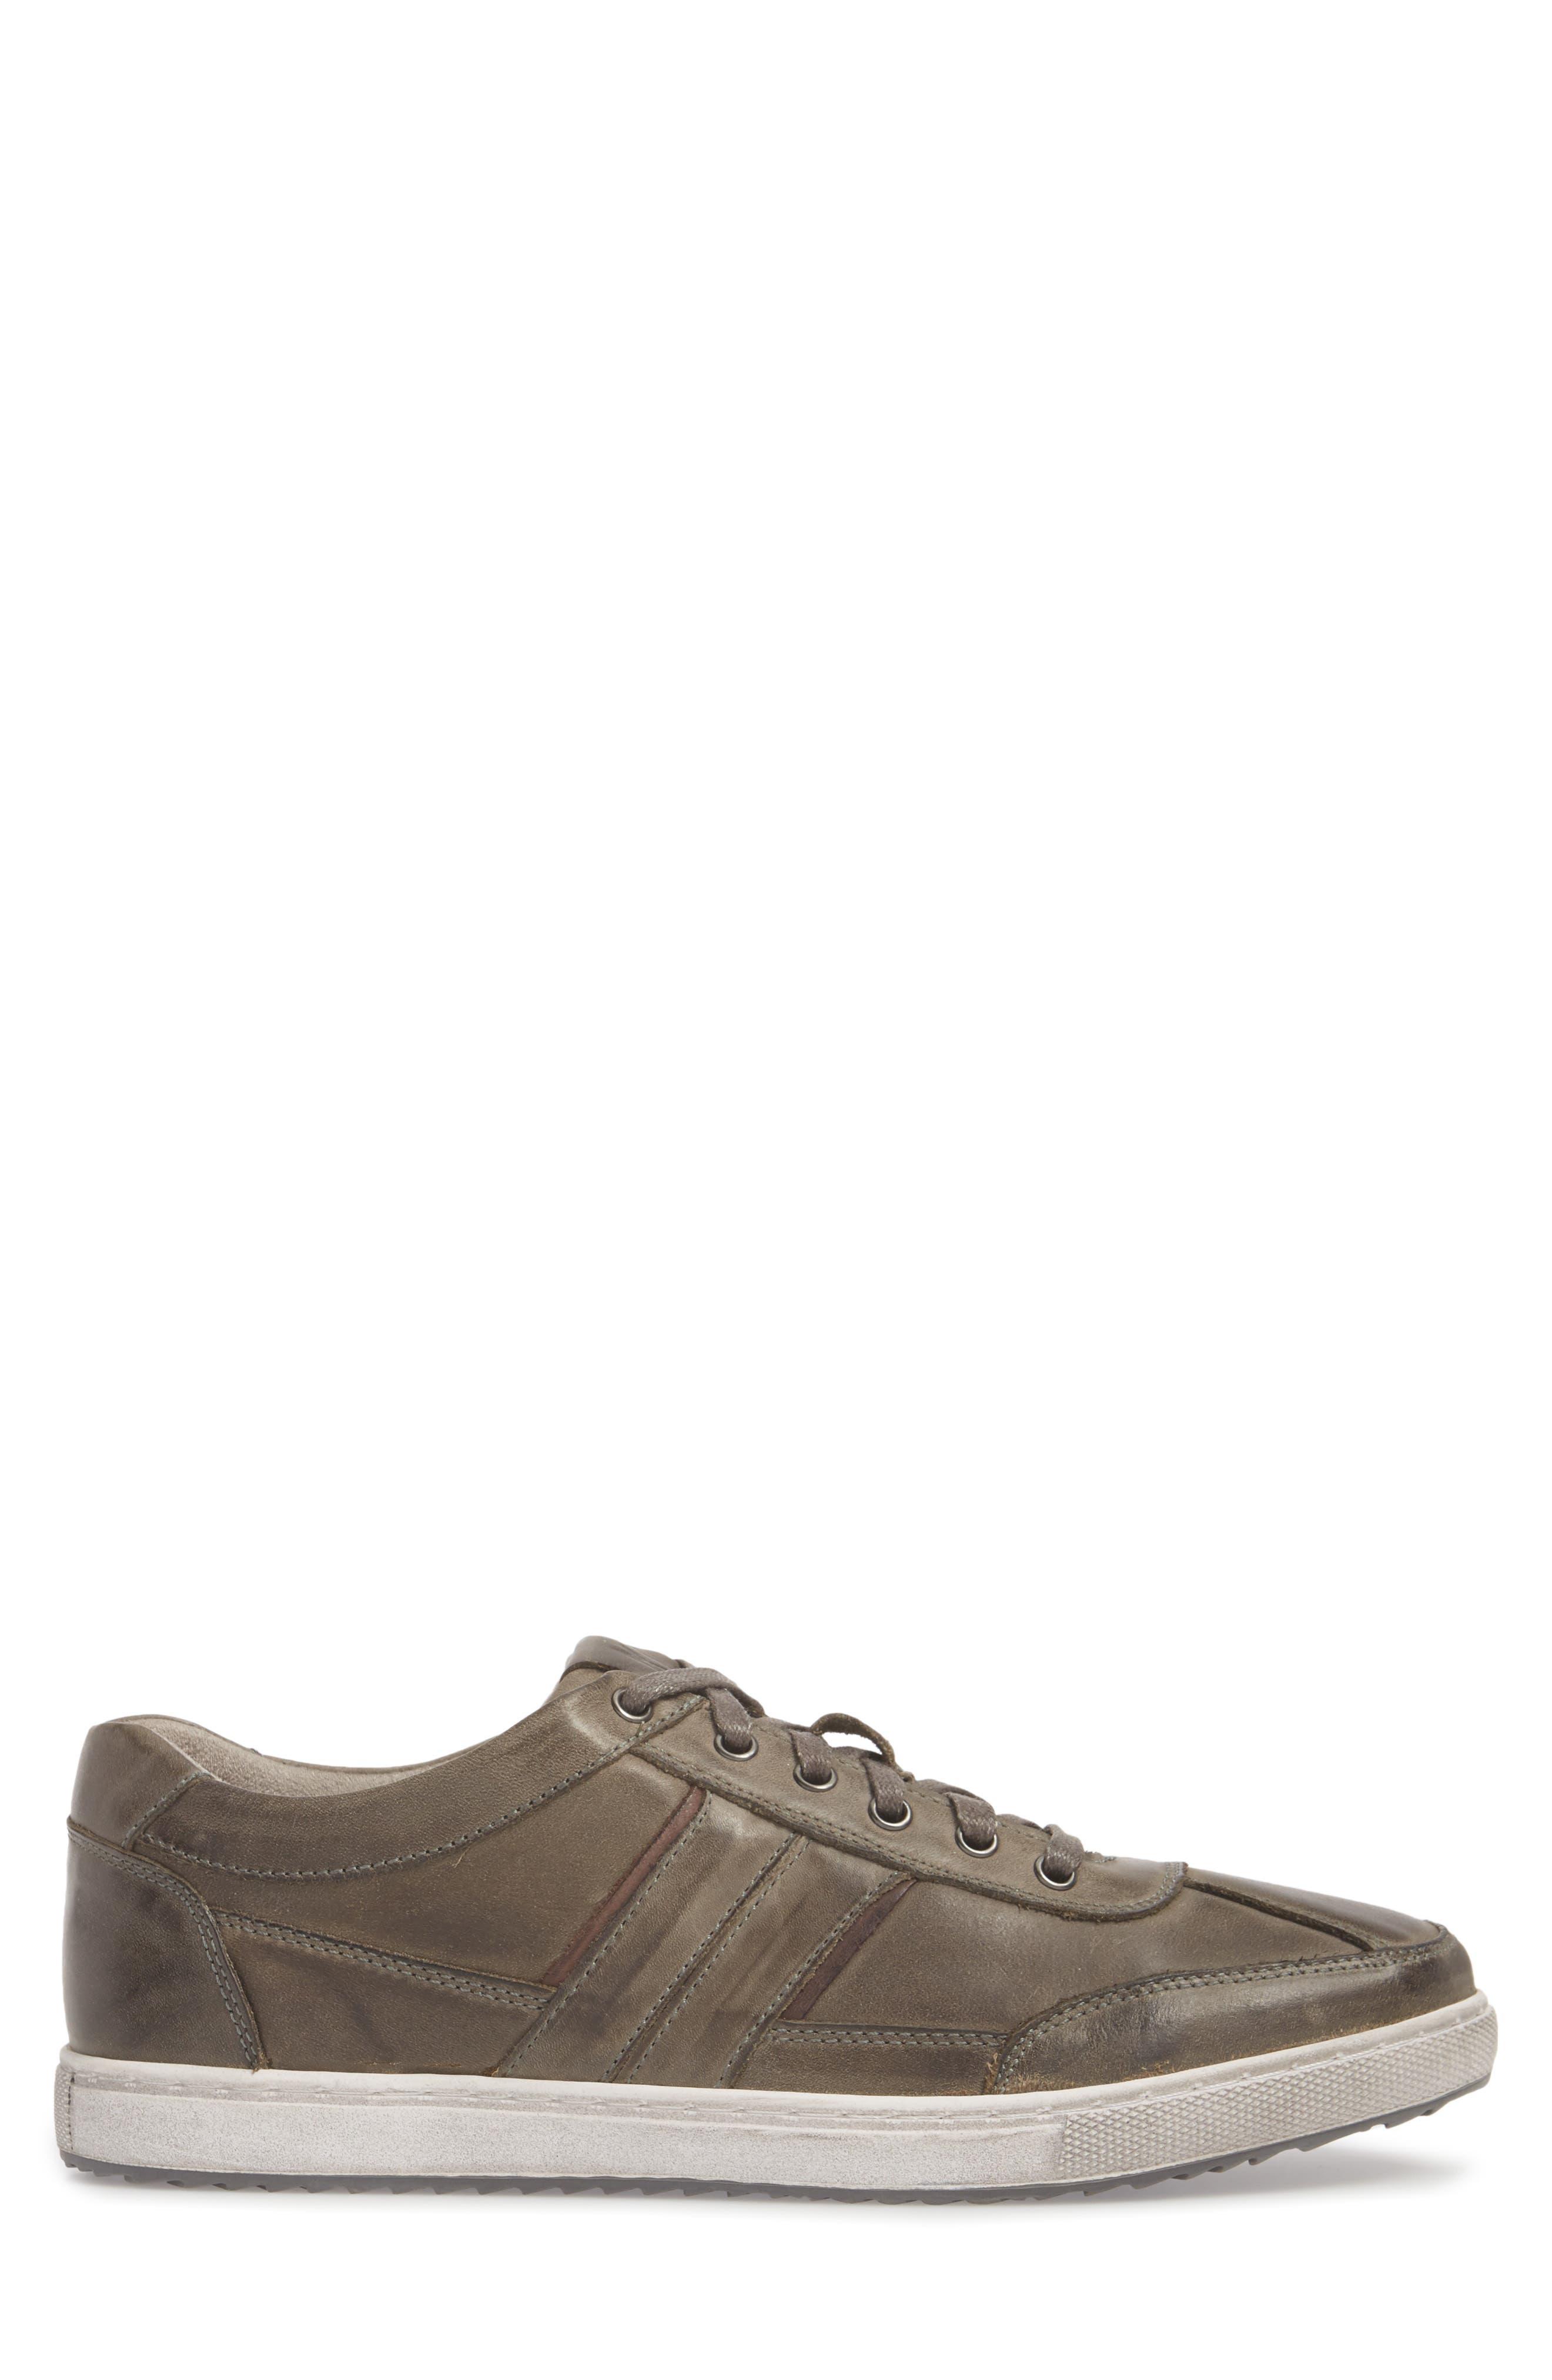 Sprinter Low Top Sneaker,                             Alternate thumbnail 3, color,                             Grey